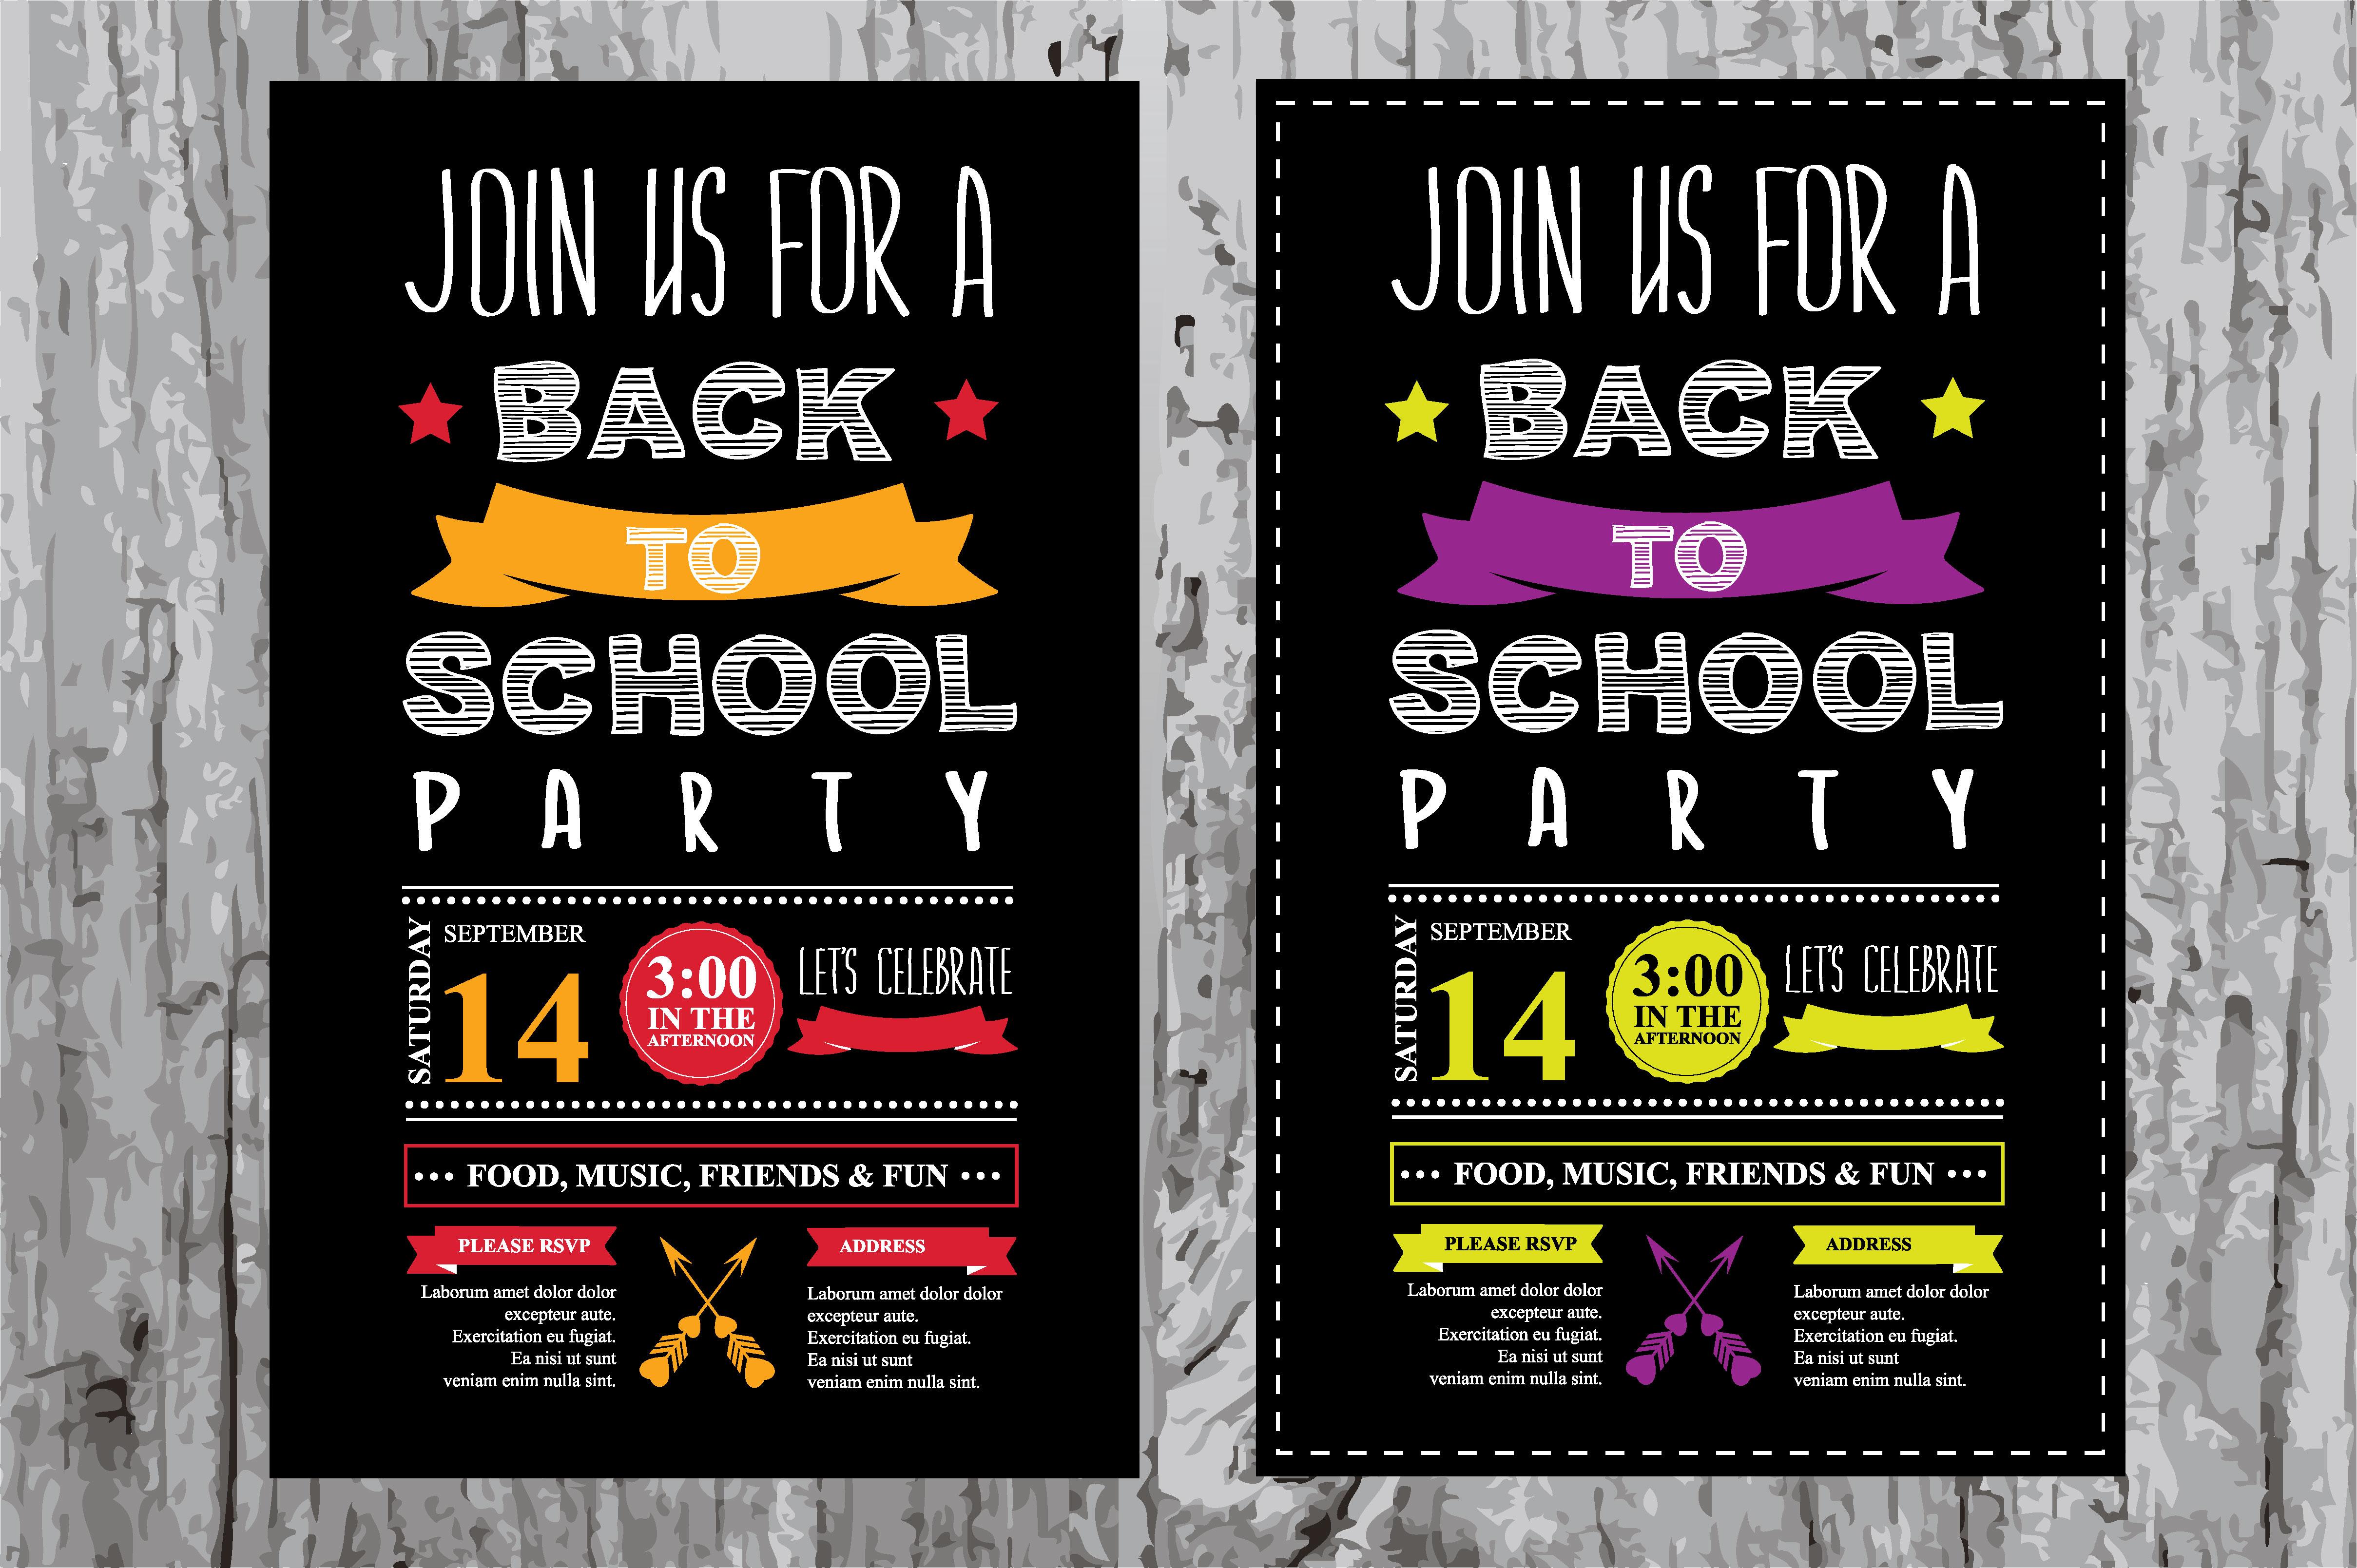 Back To School Party Invitation Invitation Templates On